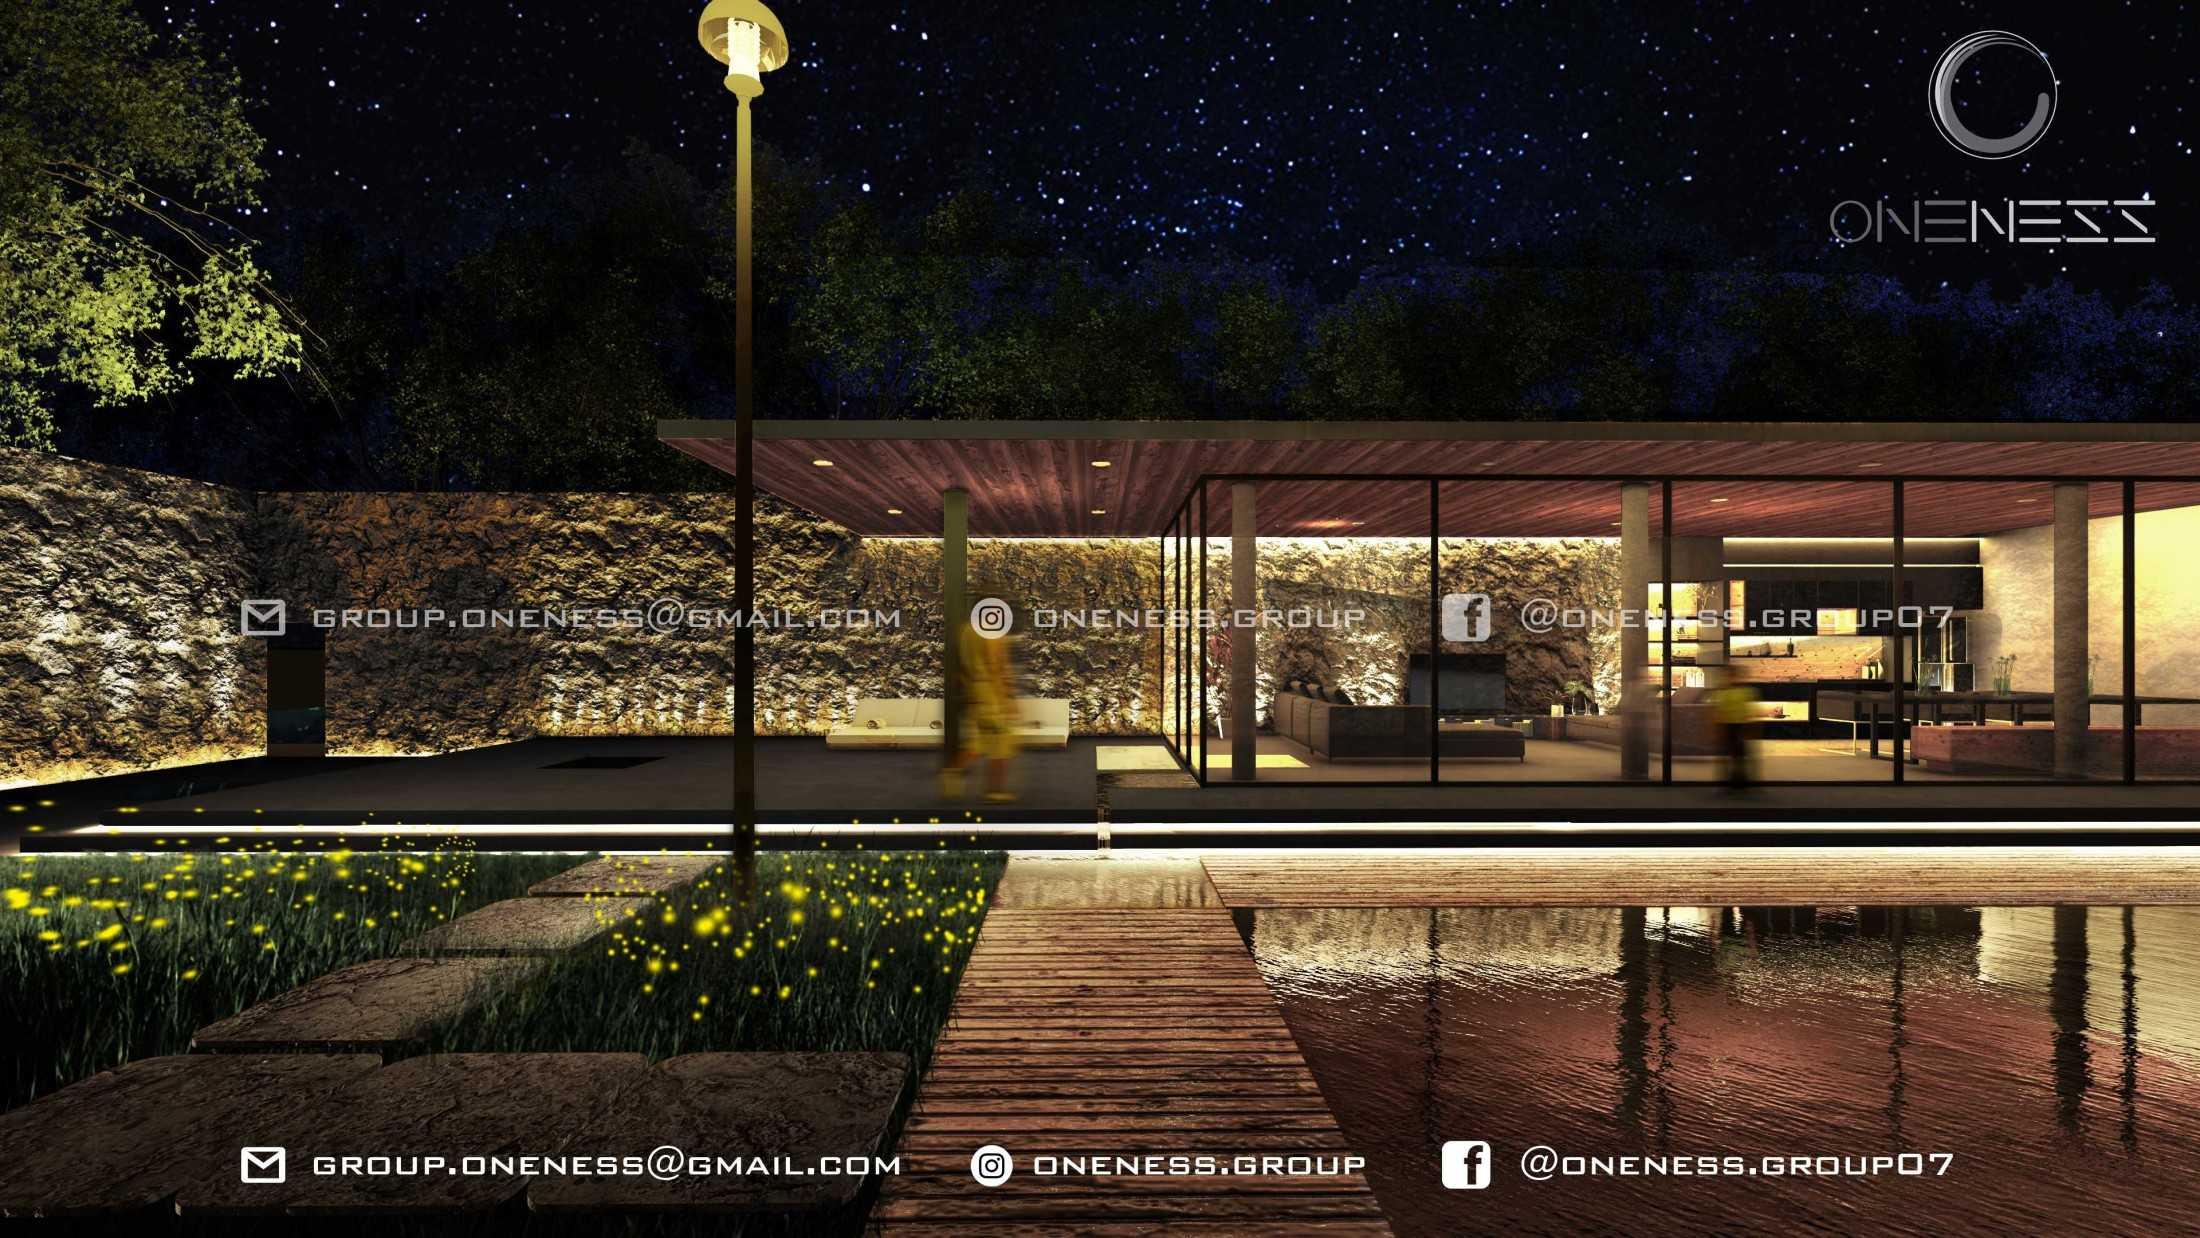 Oneness Group Villa Di Gunung Cirebon Cirebon, Kota Cirebon, Jawa Barat, Indonesia Cirebon, Kota Cirebon, Jawa Barat, Indonesia Eksterior Villa Di Gunung  98226